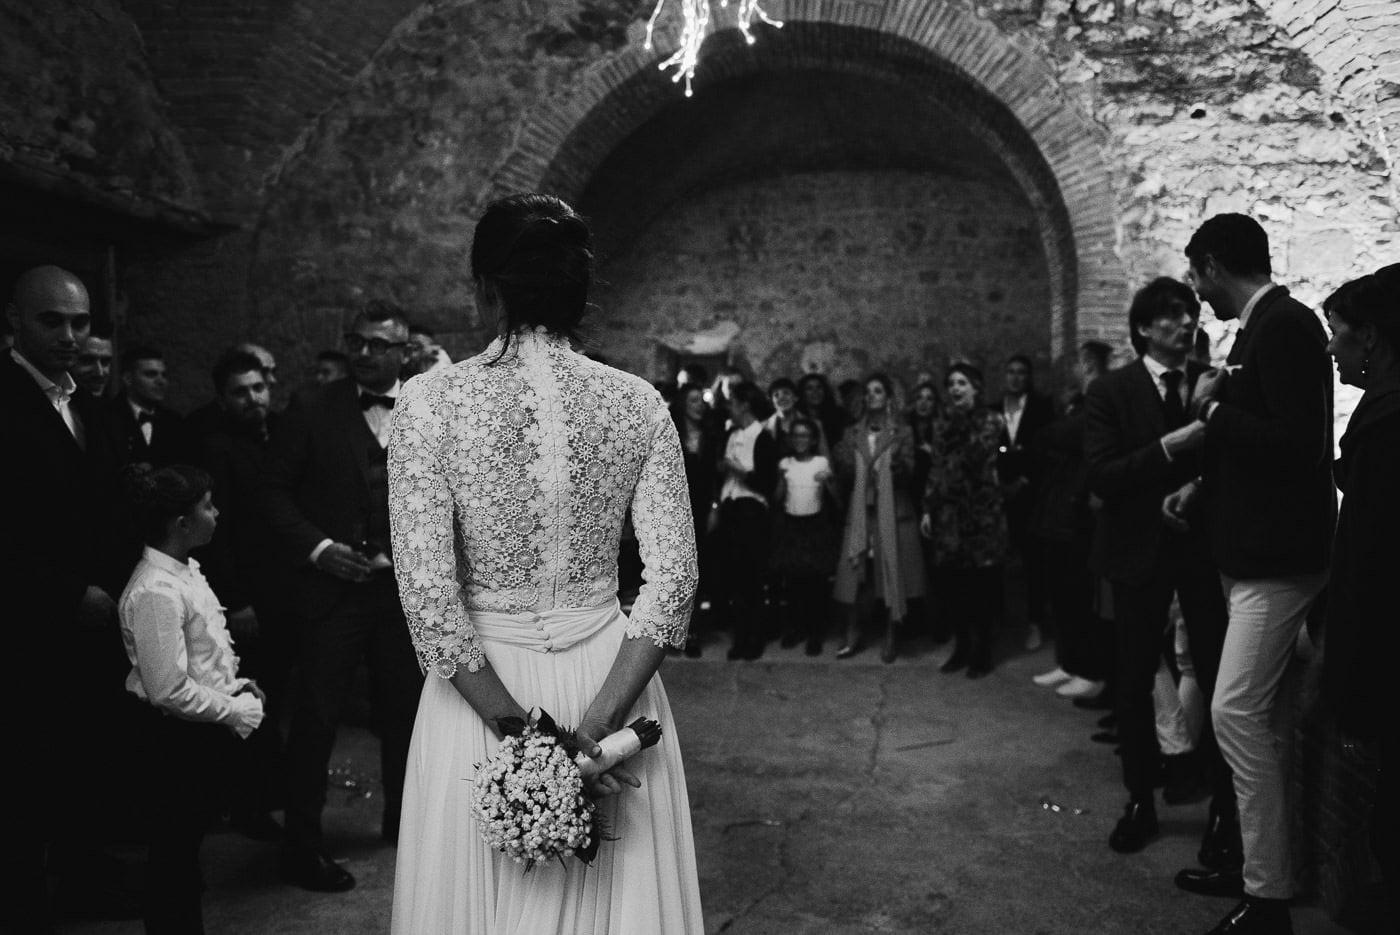 Matrimonio Giulia & Alessandro 28_12 – Alessio Nobili Photographer-68